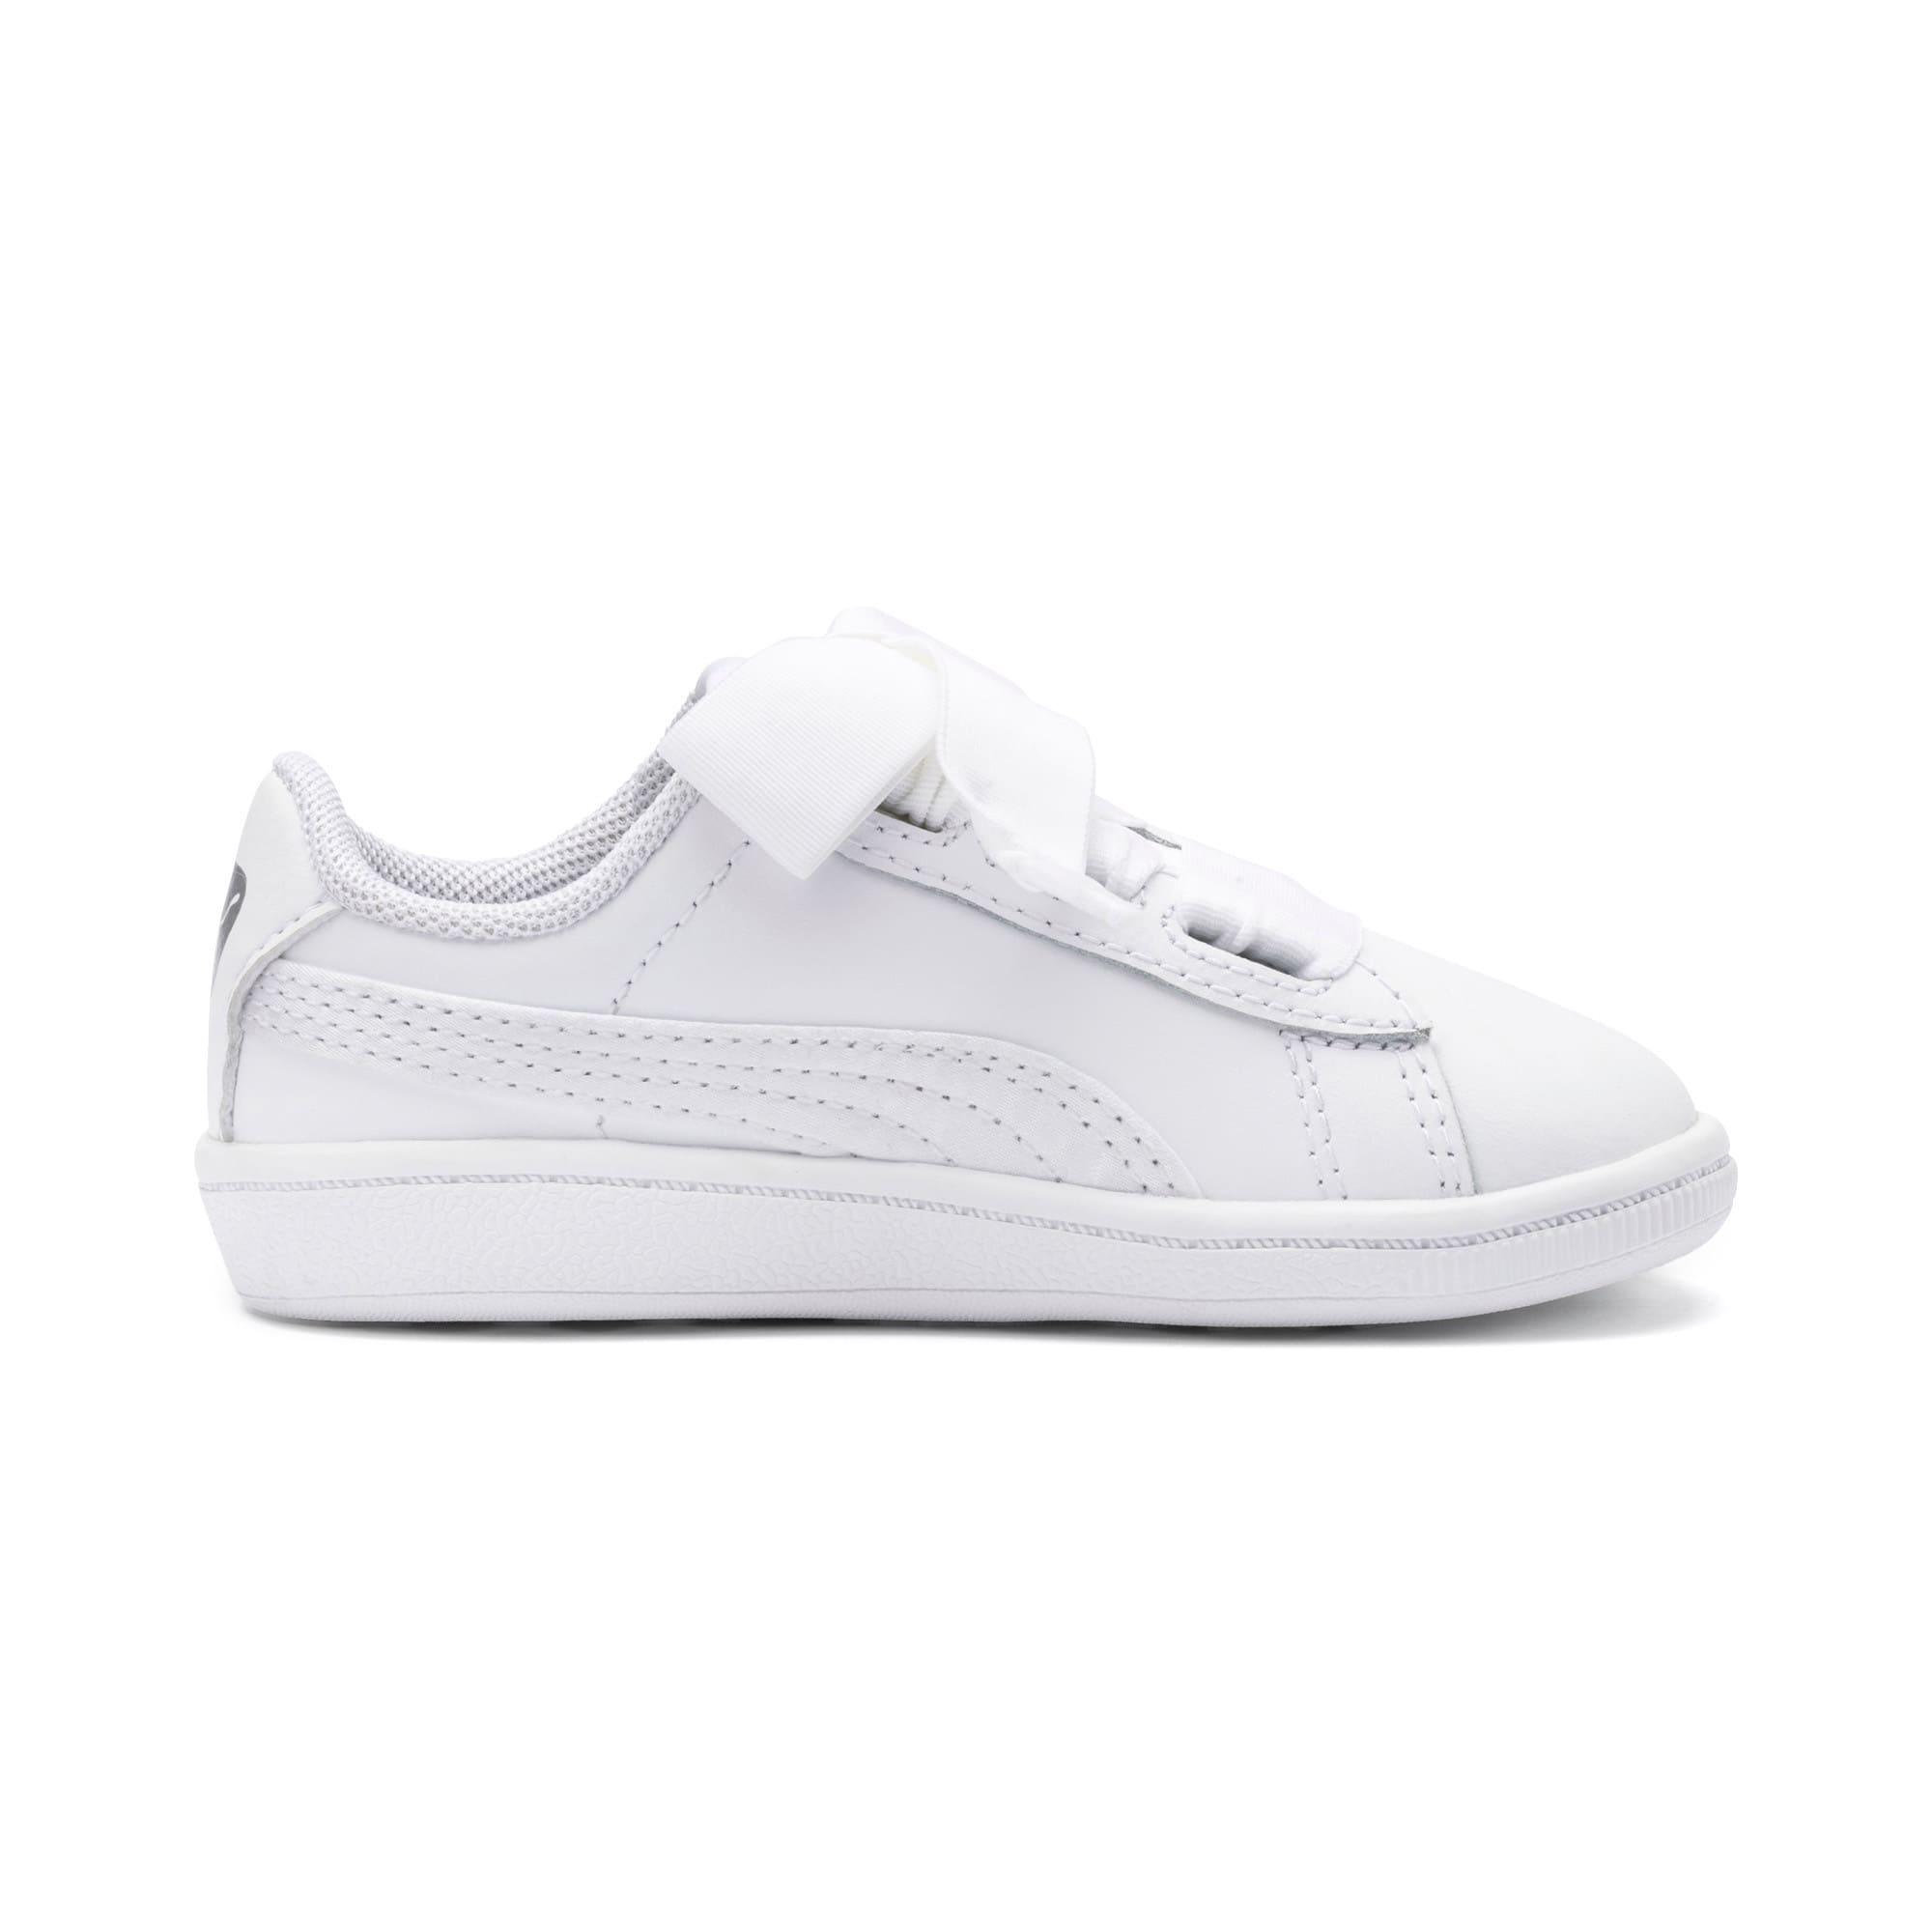 Miniatura 5 de ZapatosPUMA Vikky Ribbon Satin AC para niños, Puma White-Puma White, mediano